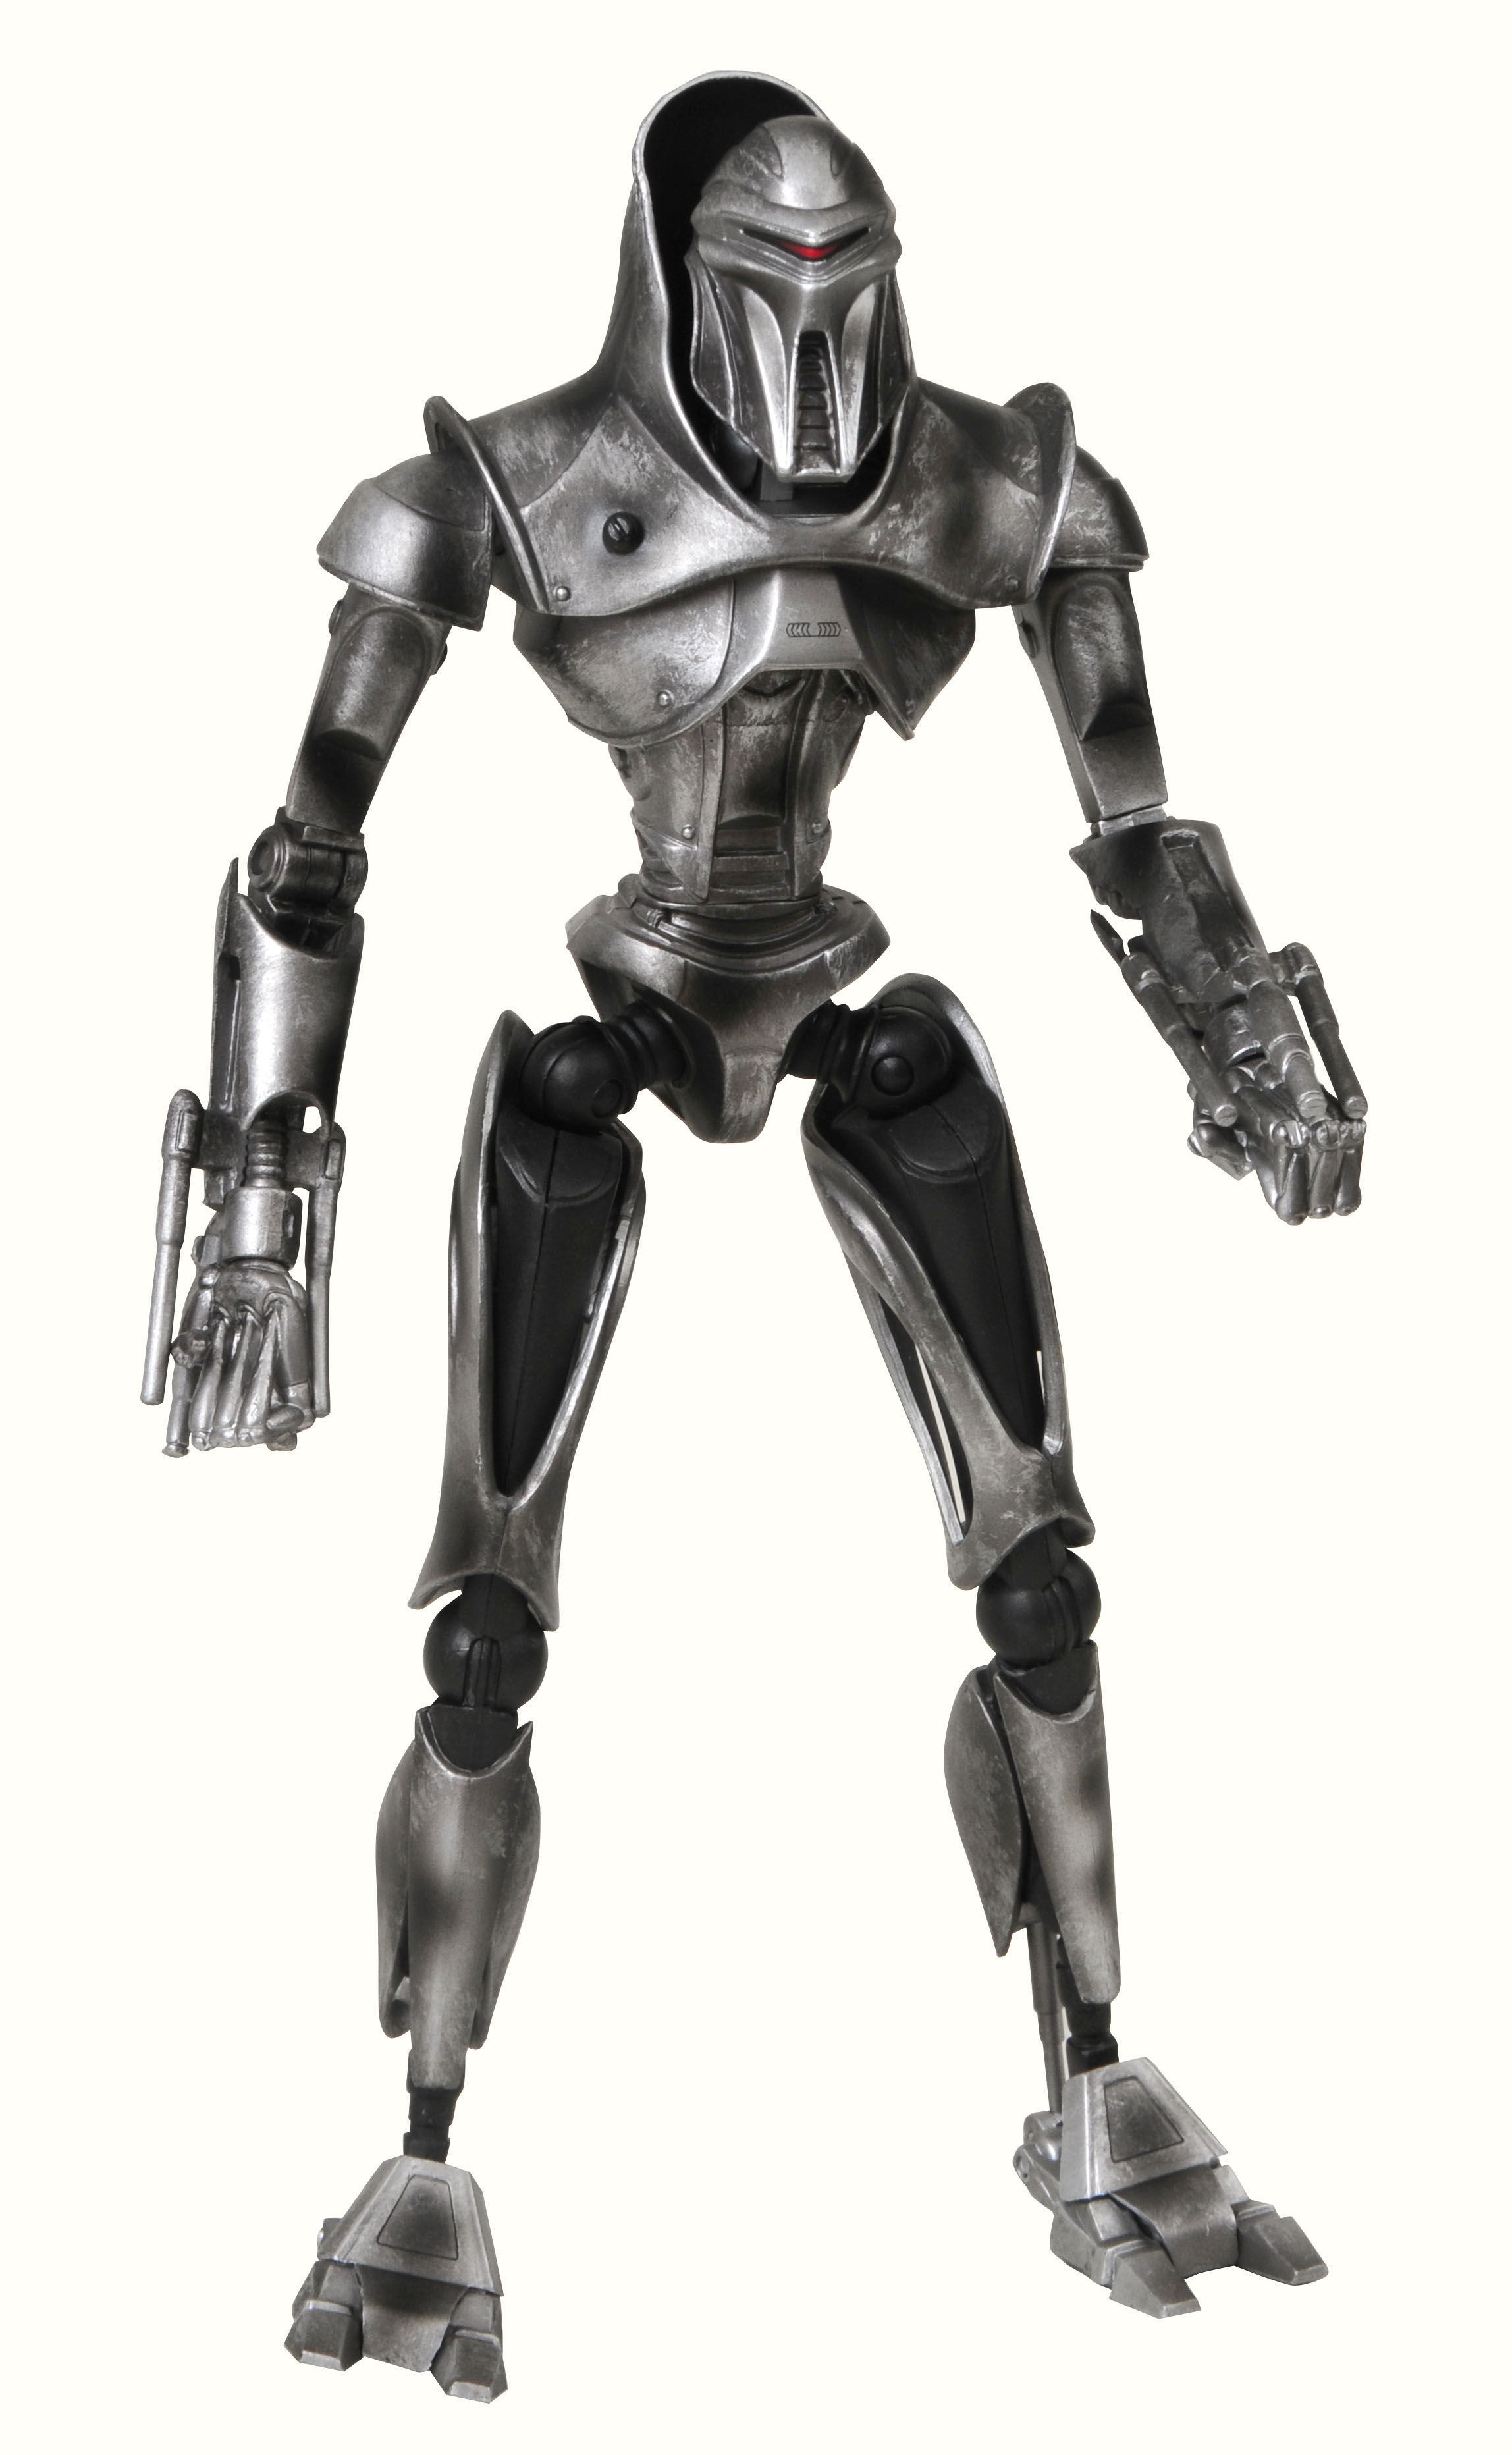 Diamond Select Toys Battlestar Galactica Toys R Us Wave